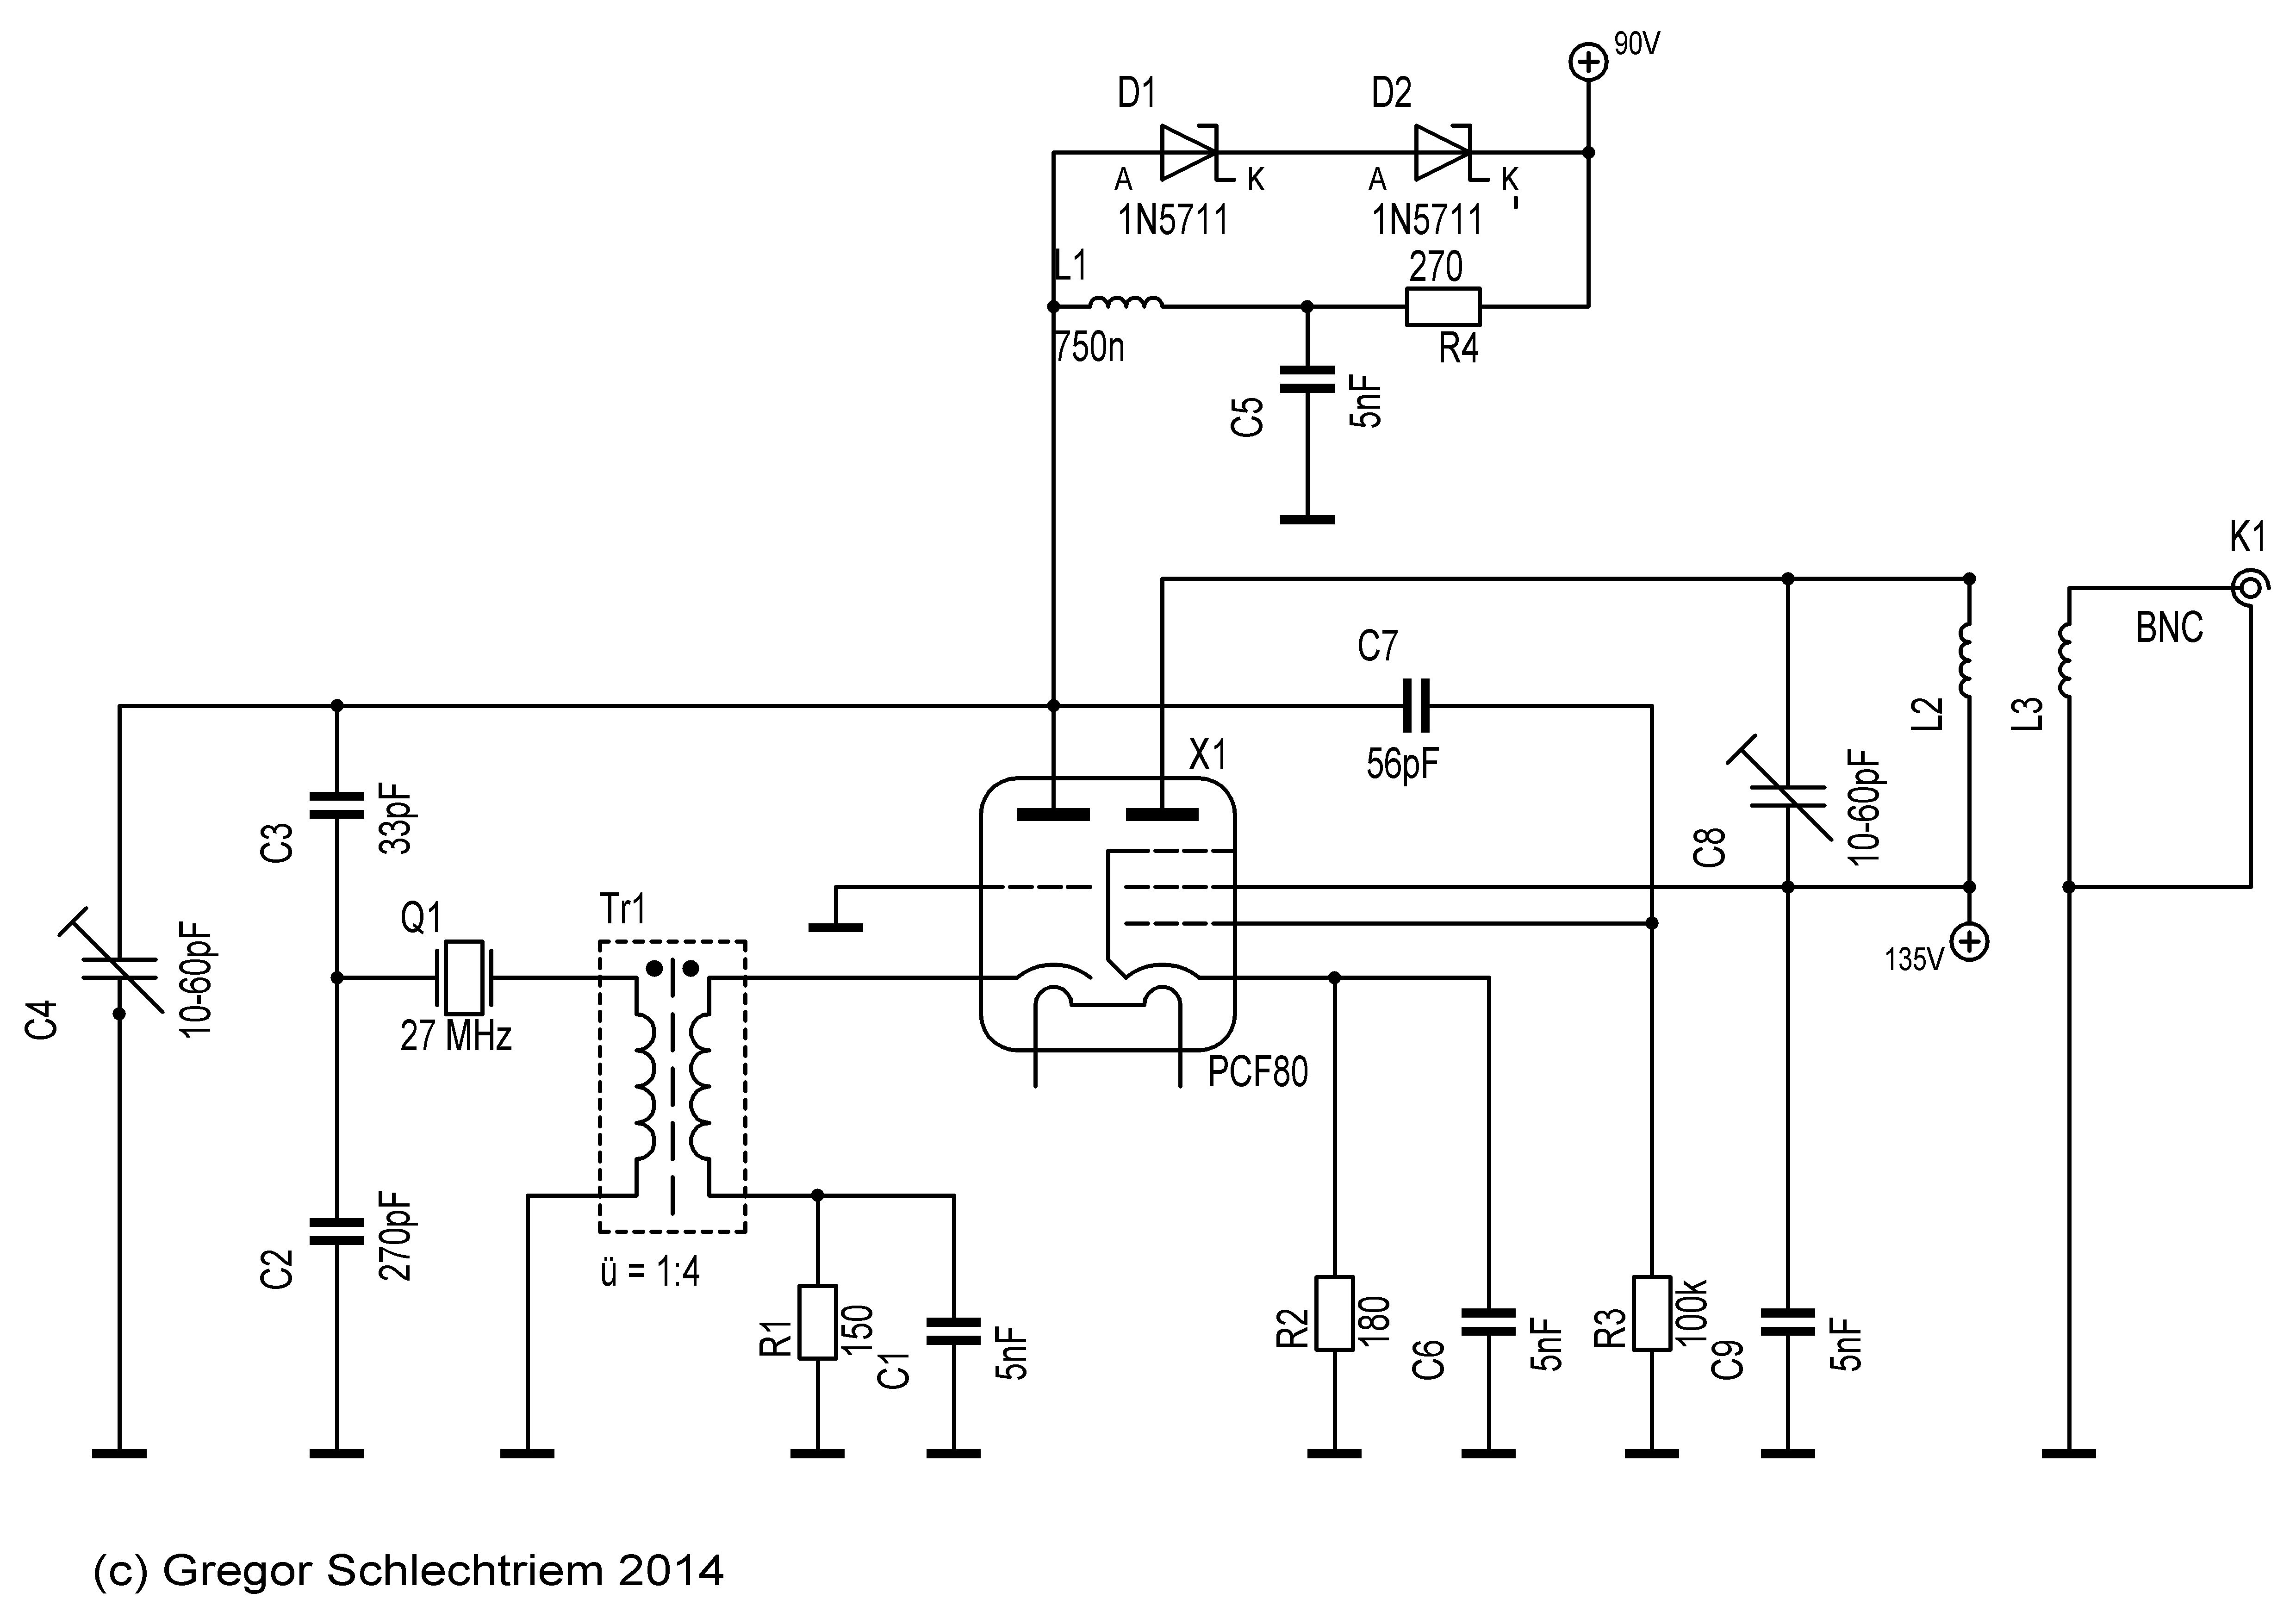 Großzügig Gitarre Schaltplan Maker Bilder - Schaltplan Serie Circuit ...